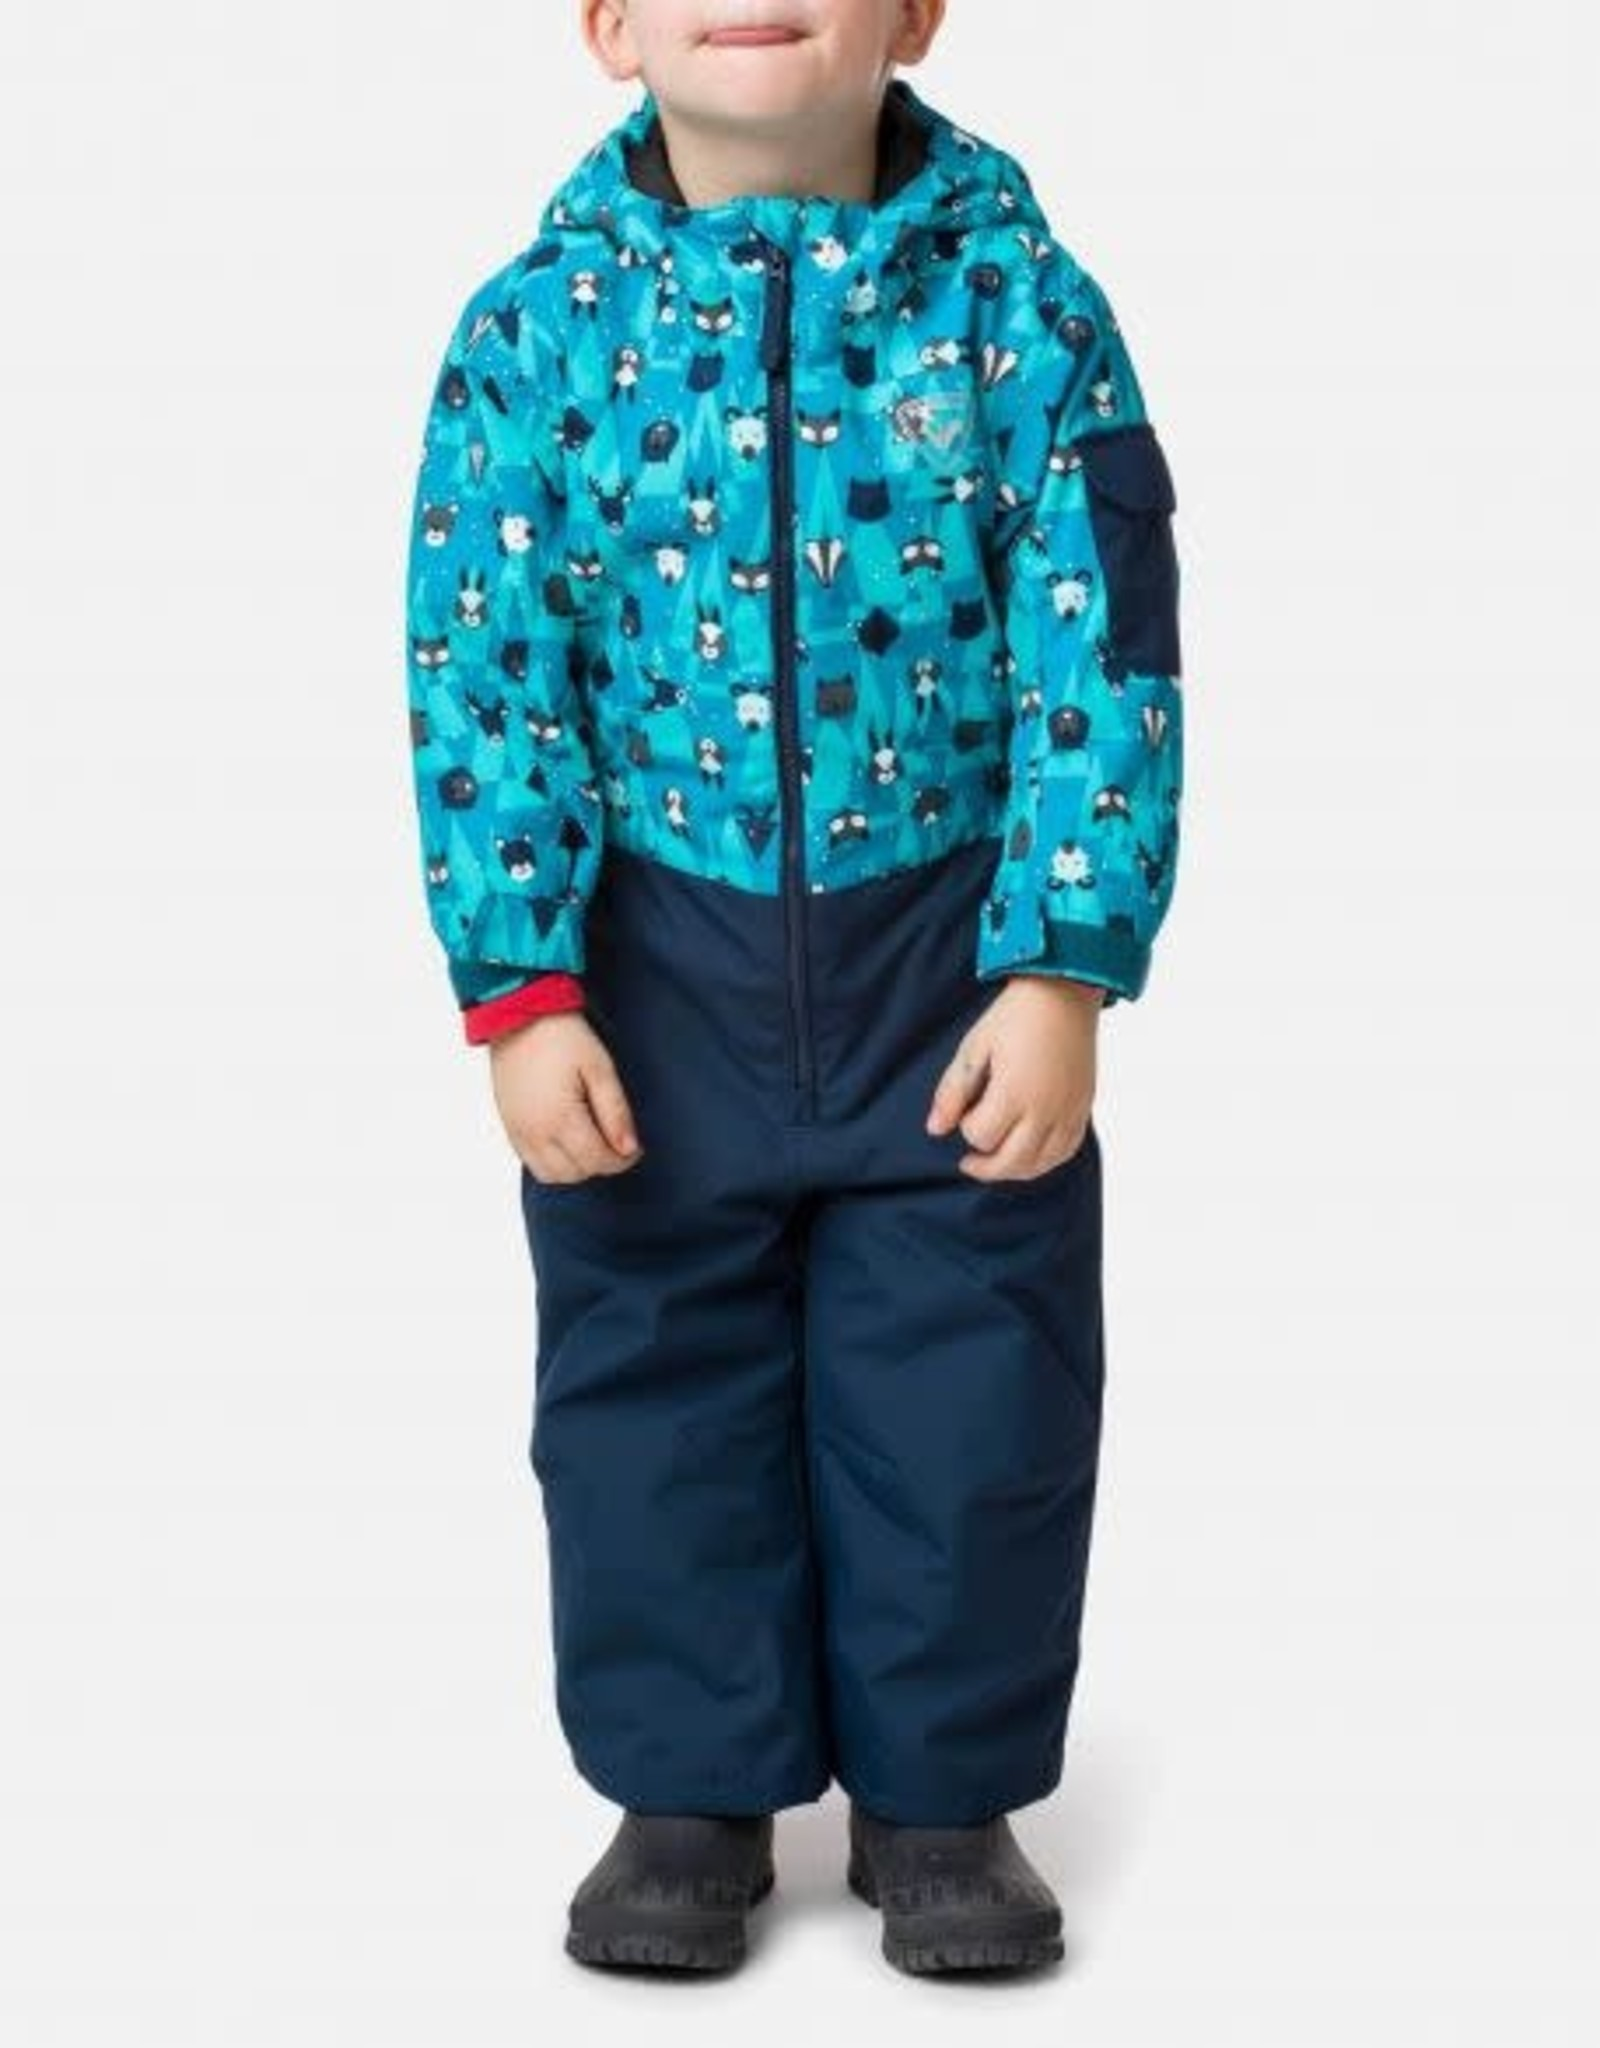 ROSSIGNOL Rossignol Child Flocon one pc Suit Size 2